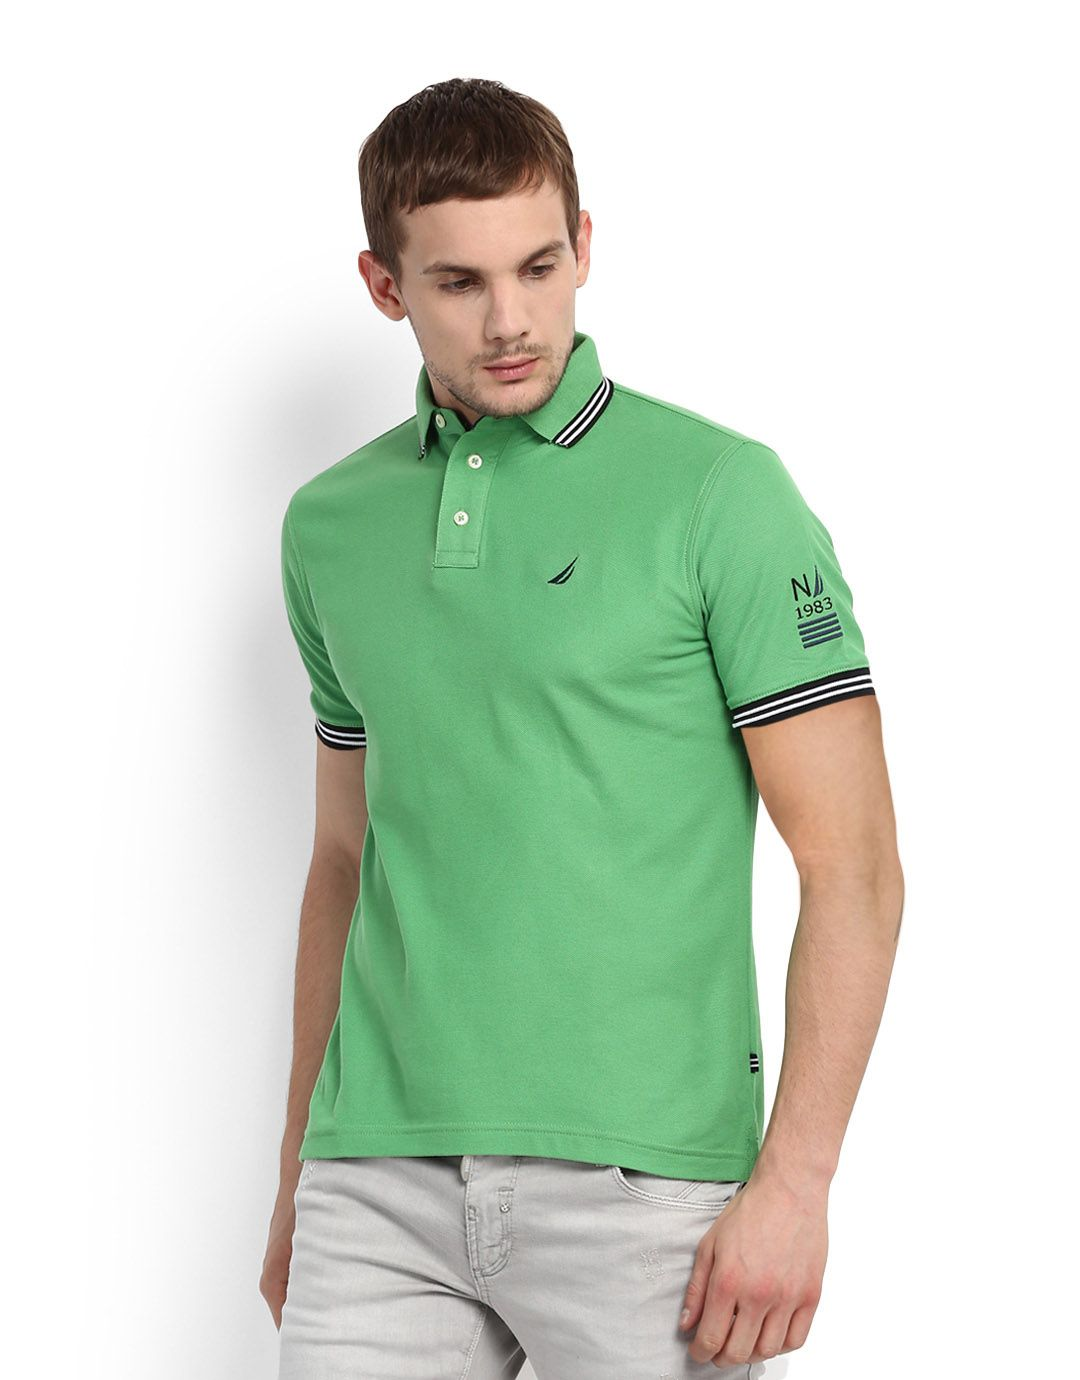 Nautica Green Polo T-Shirt